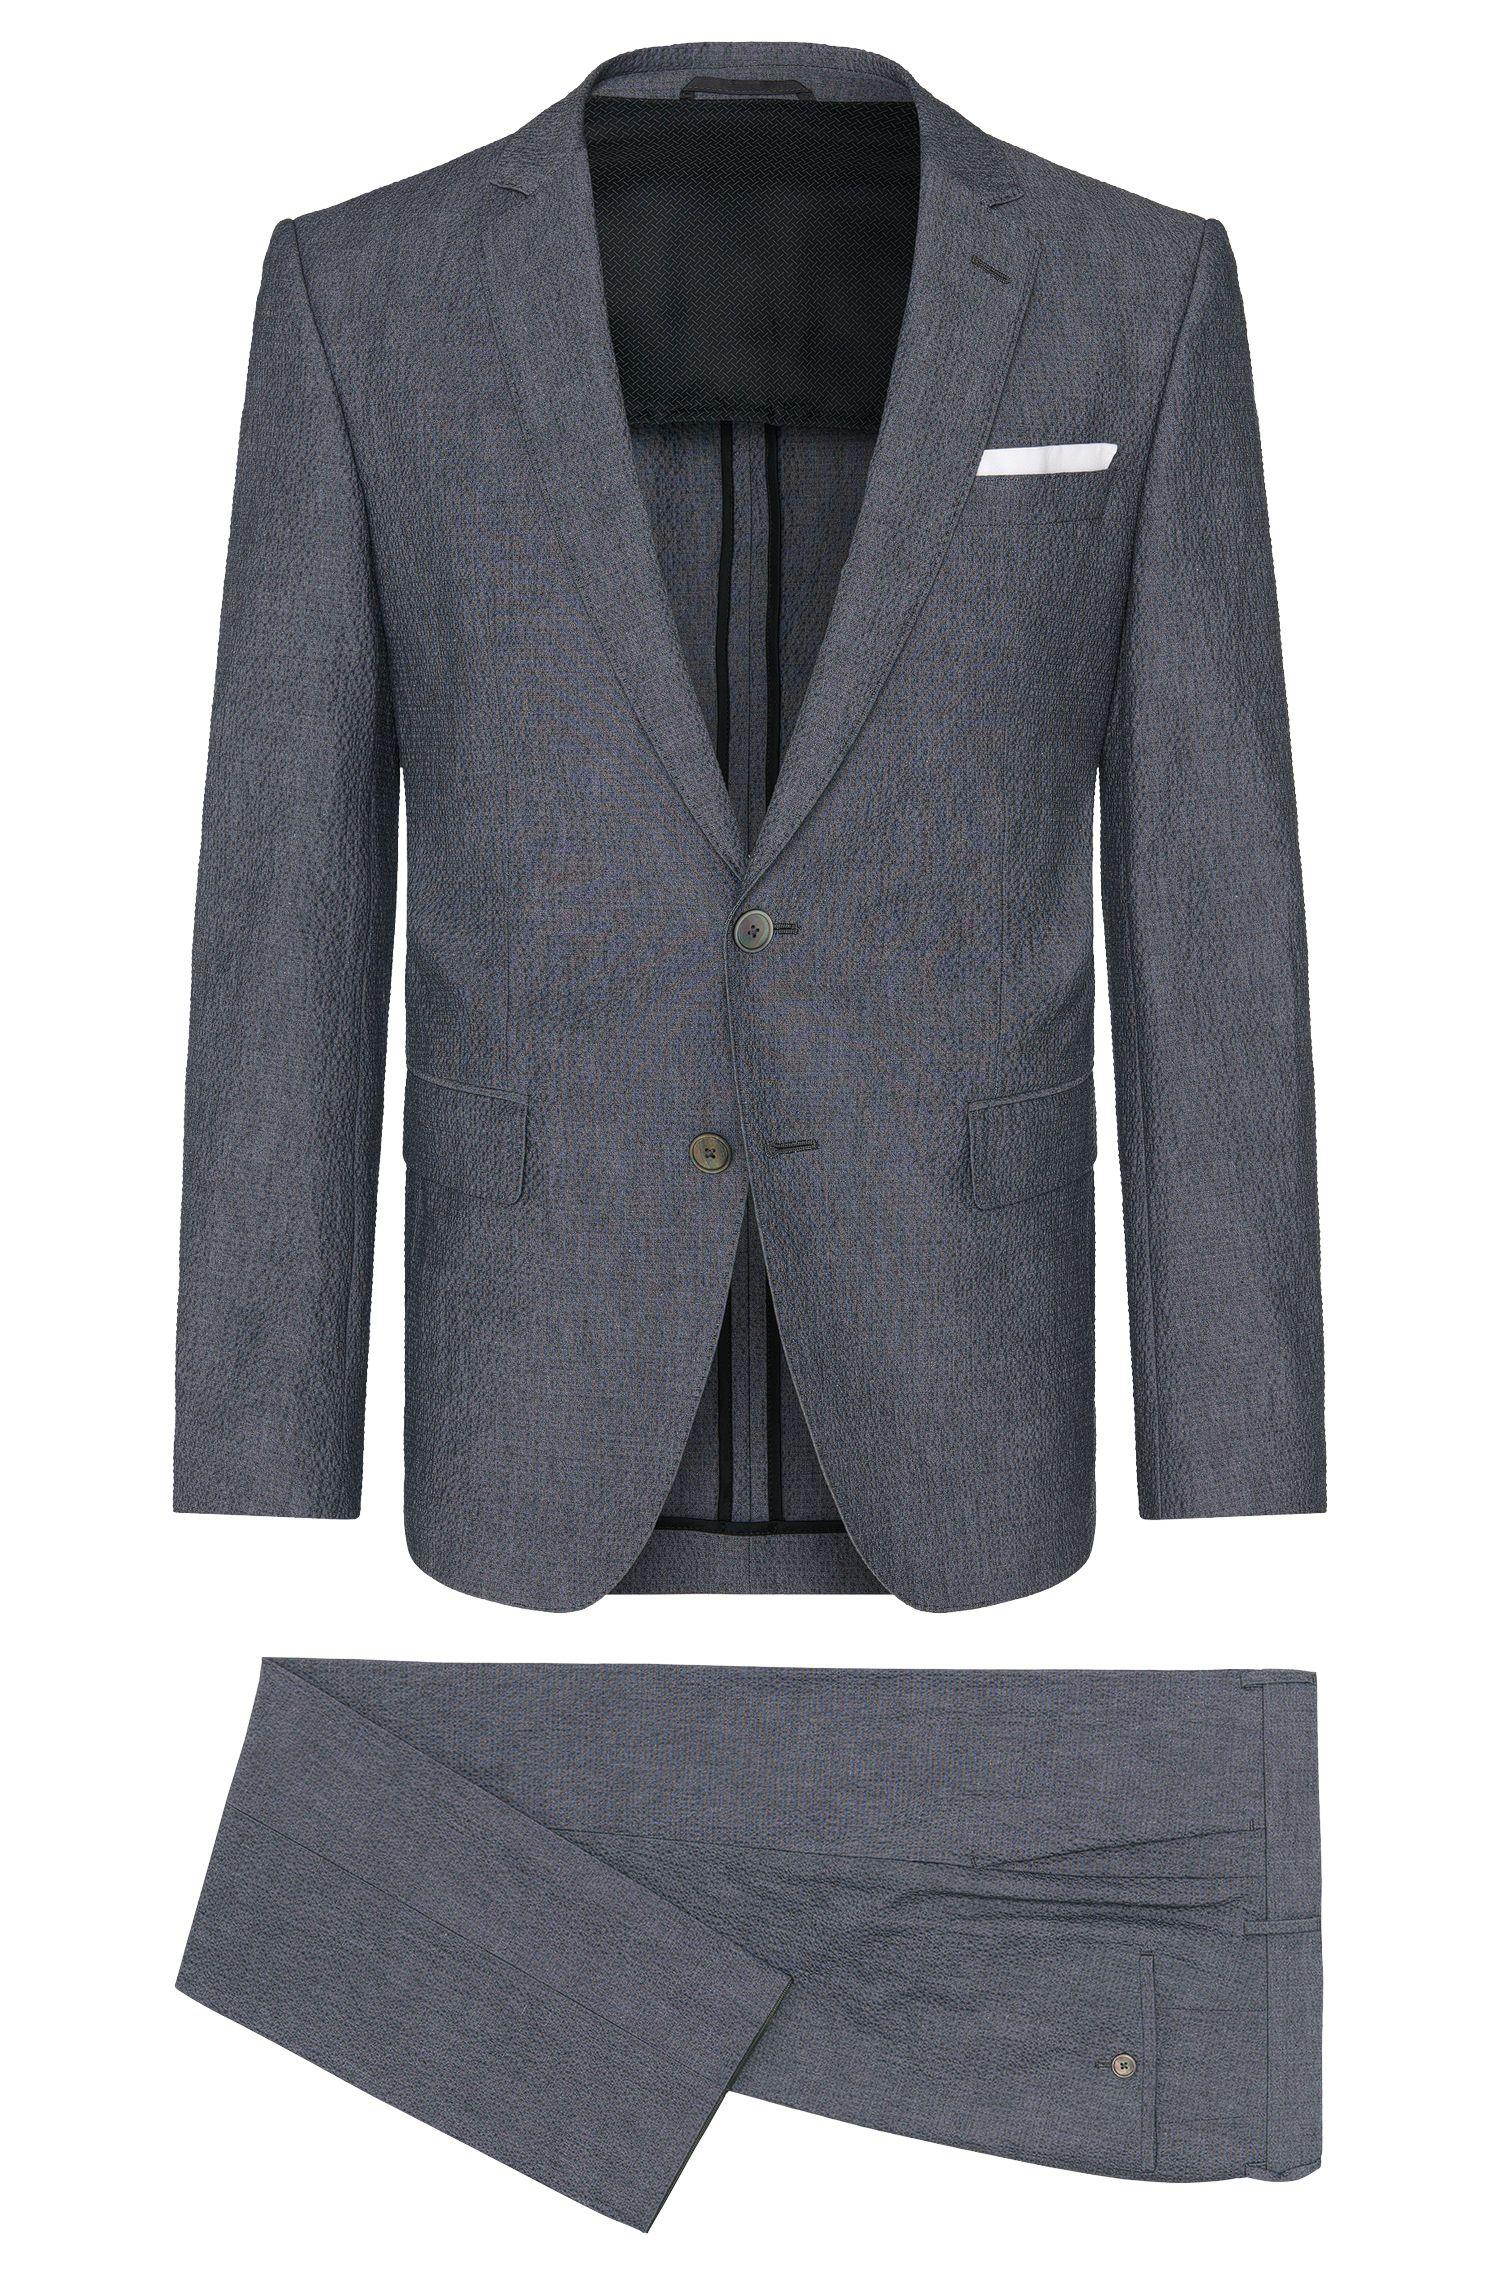 'Hedson/Gander' | Slim Fit, Stretch Cotton Seersucker Suit